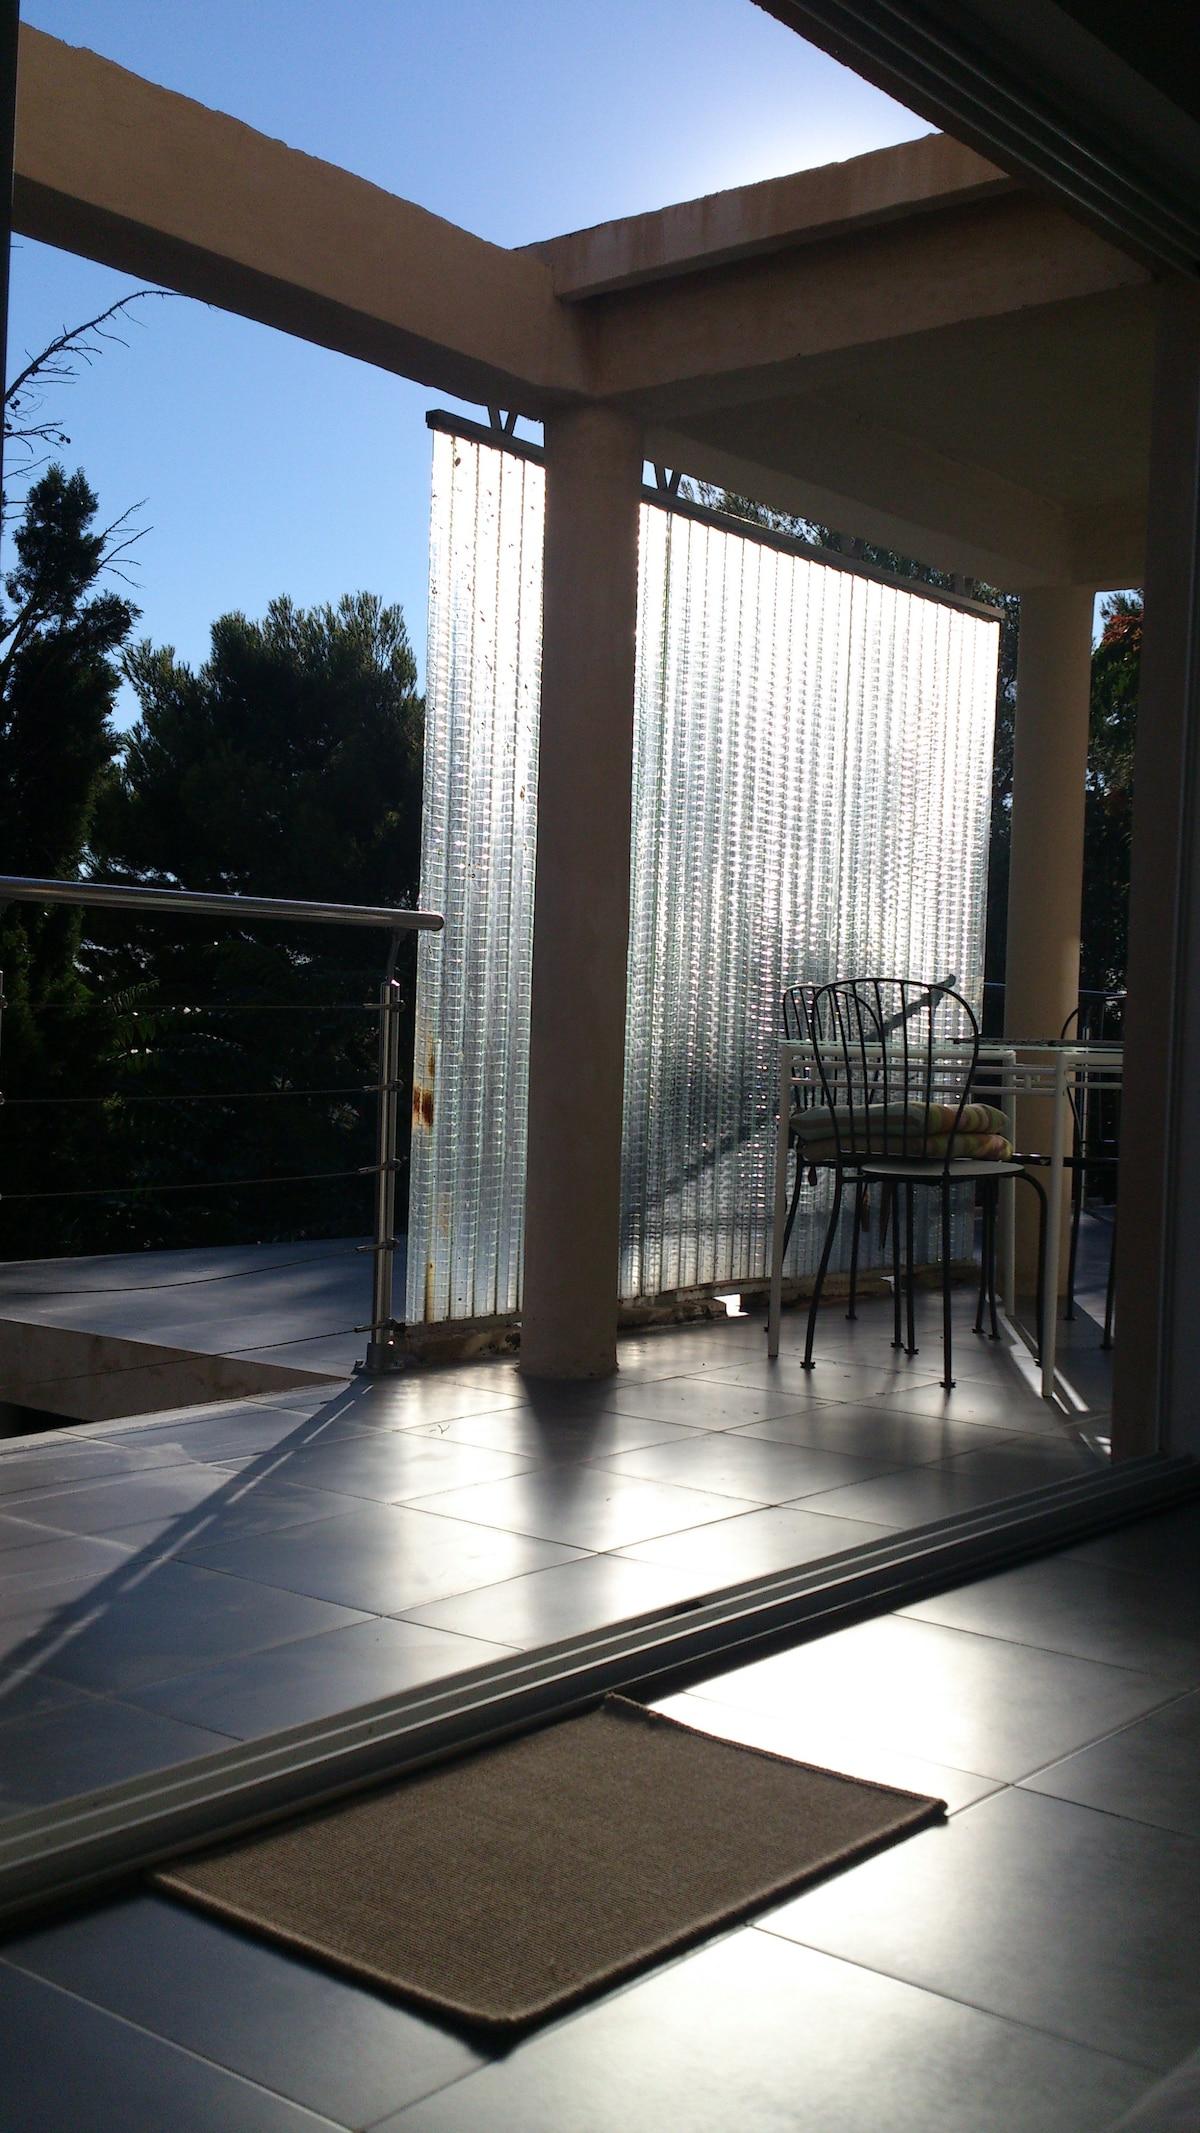 veranda space on the terraces